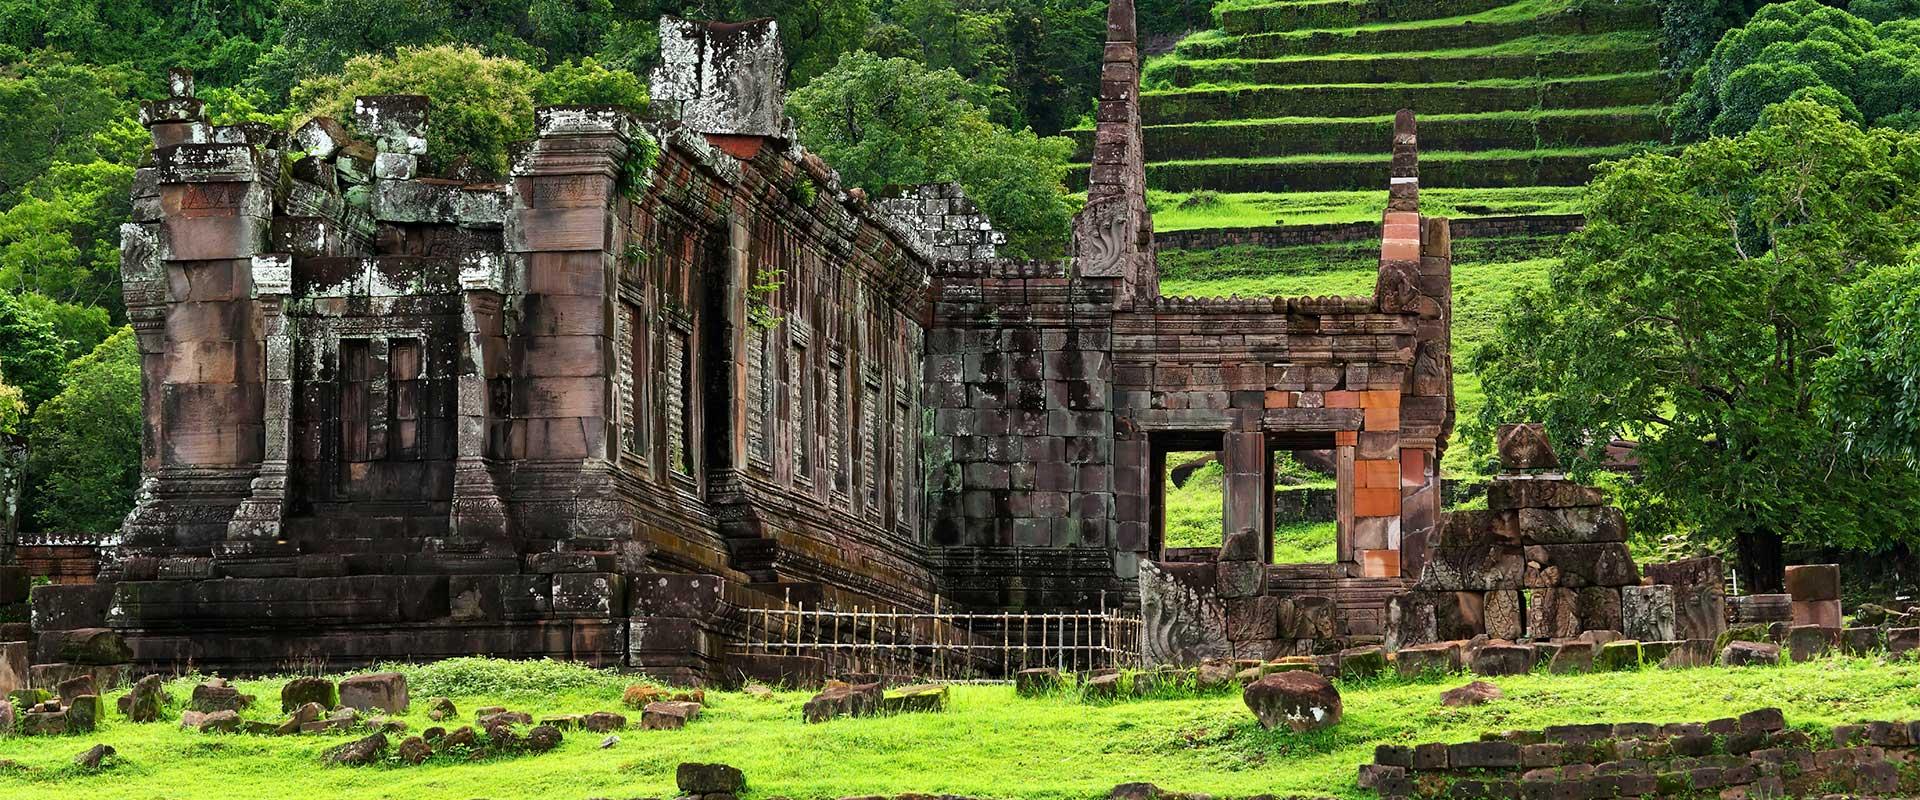 Laos tours with Hanoi Voyages within 7 days